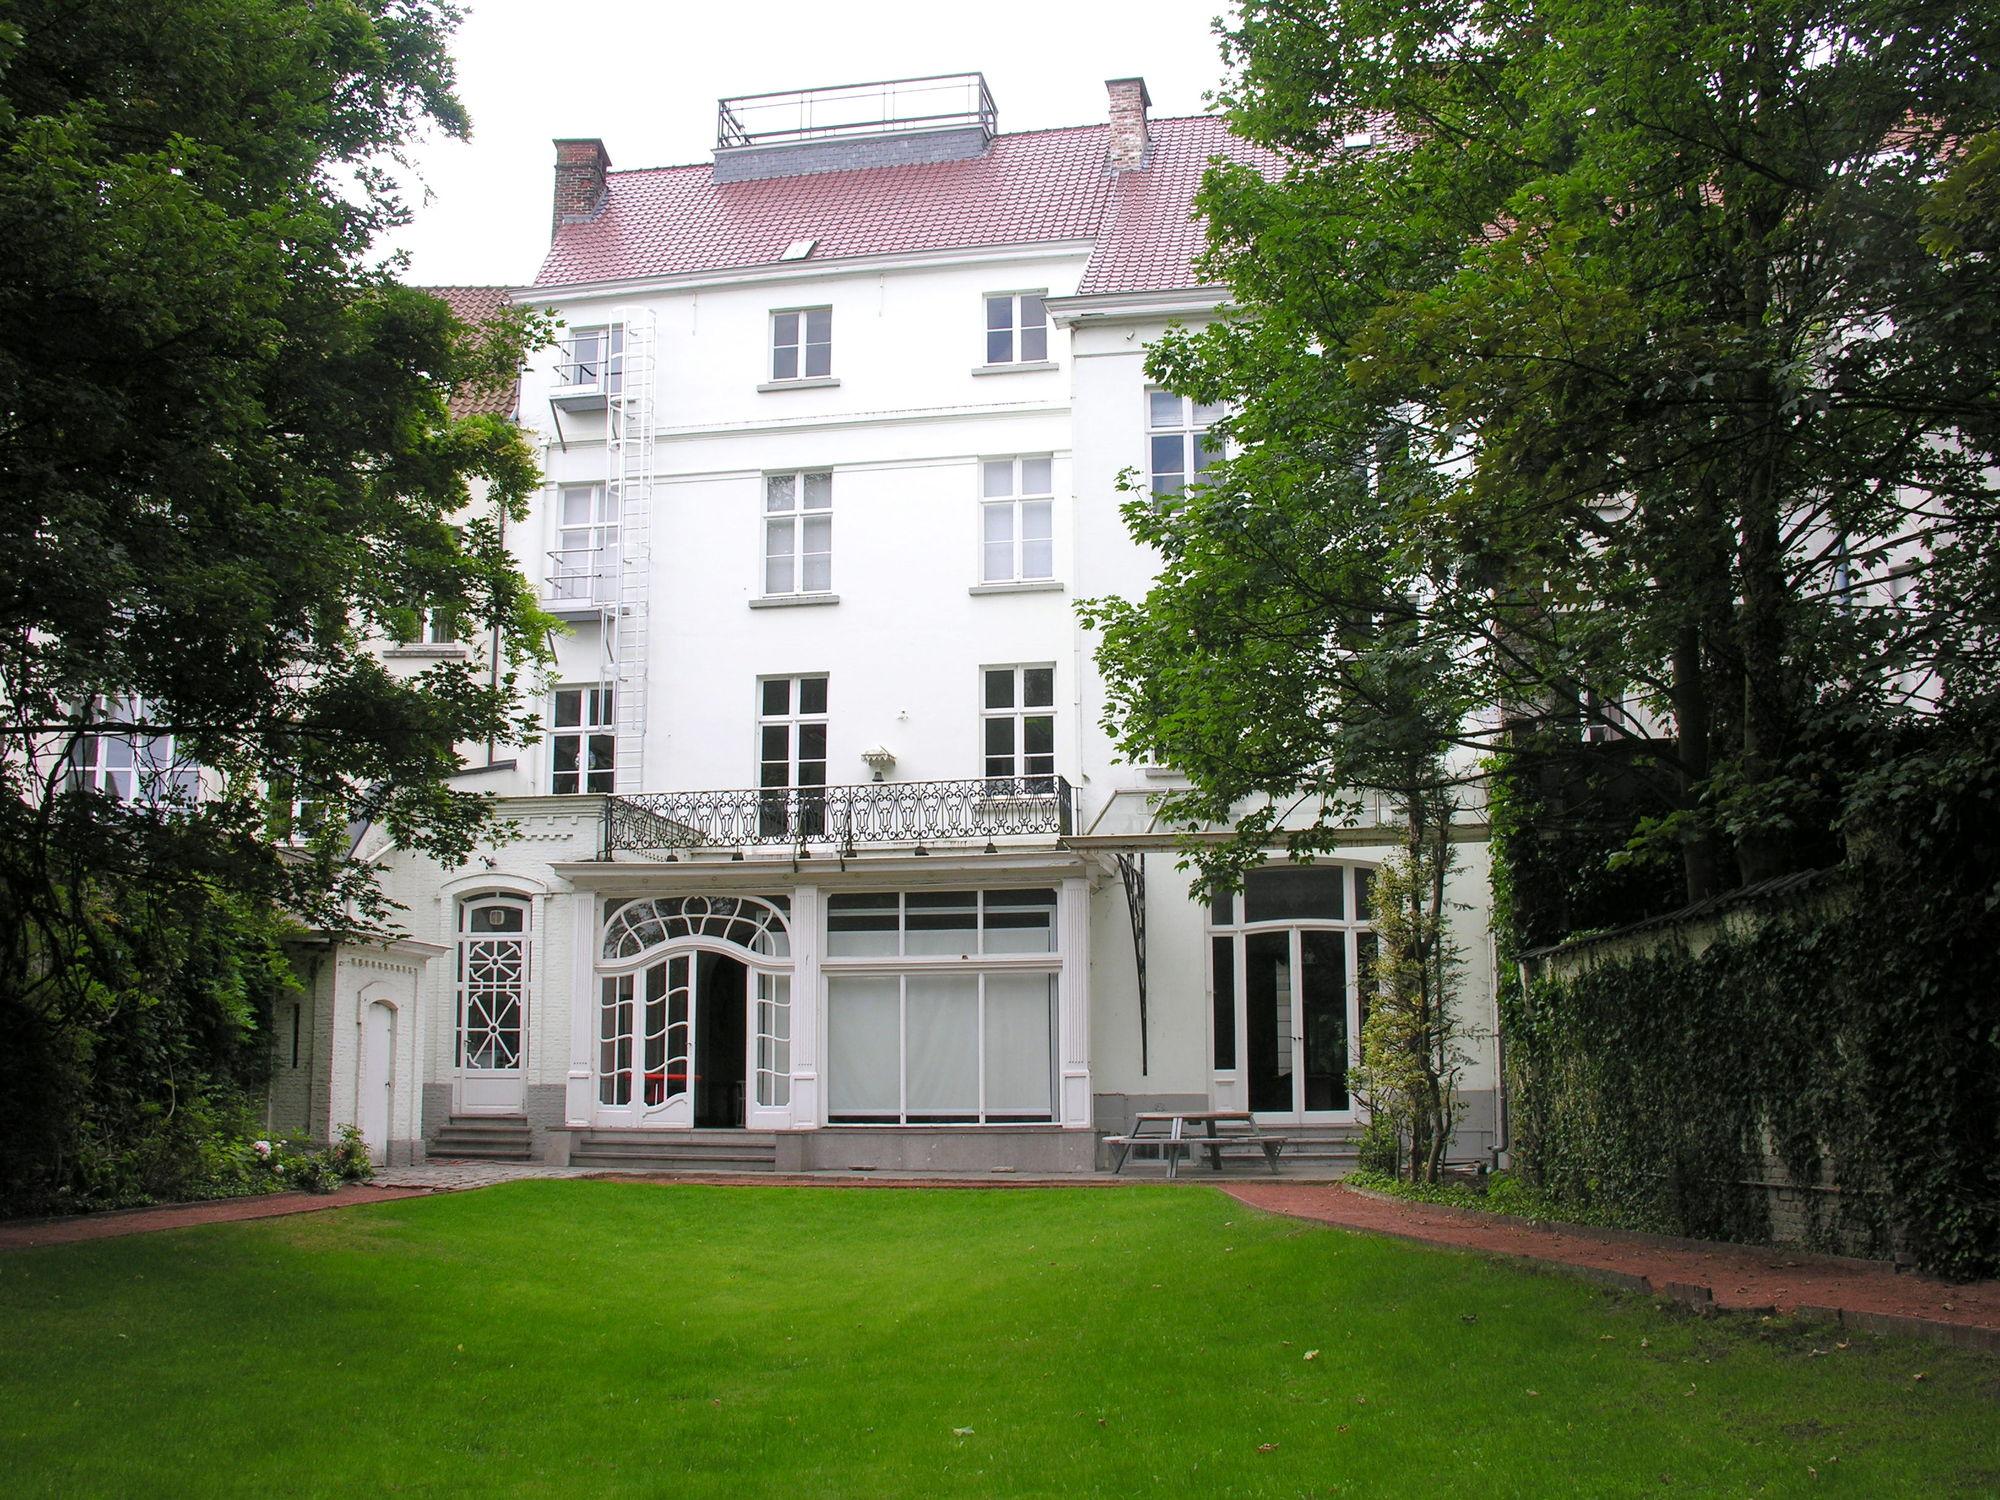 Huis dokter Vander Plancke